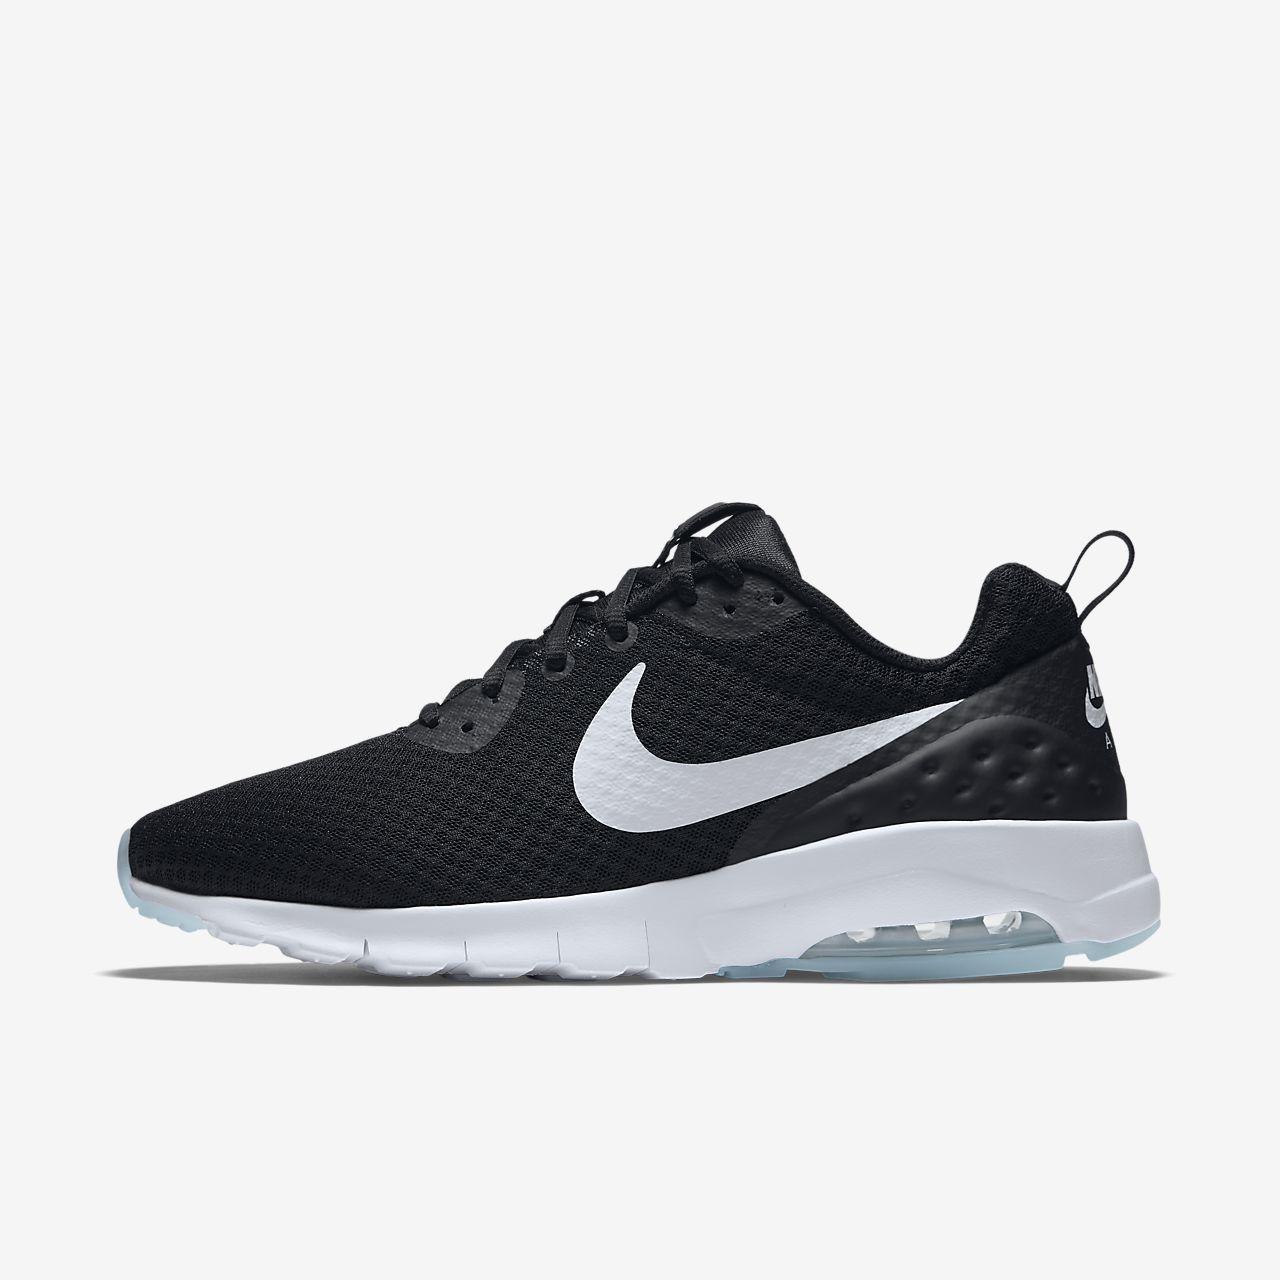 size 40 e5372 e0ca9 ... Nike Air Max Motion Low-sko til mænd